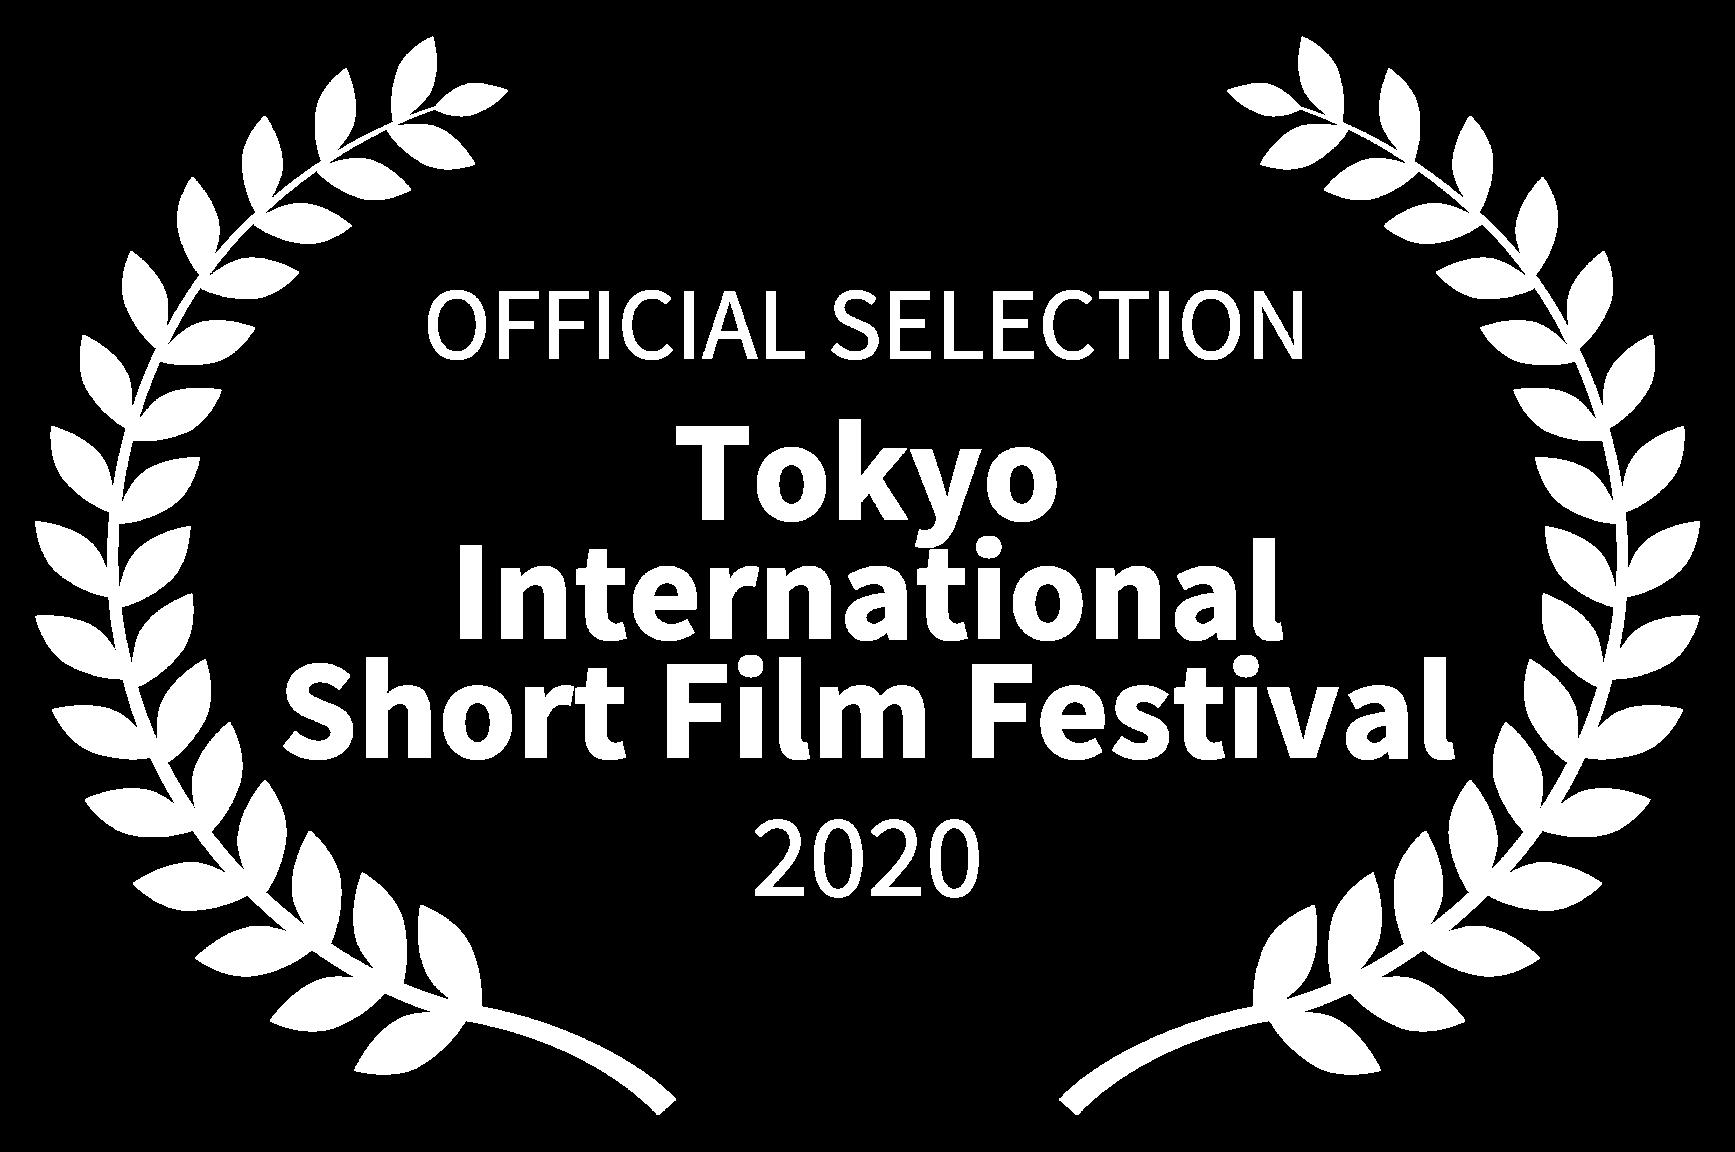 OFFICIAL SELECTION - Tokyo International Short Film Festival - 2020